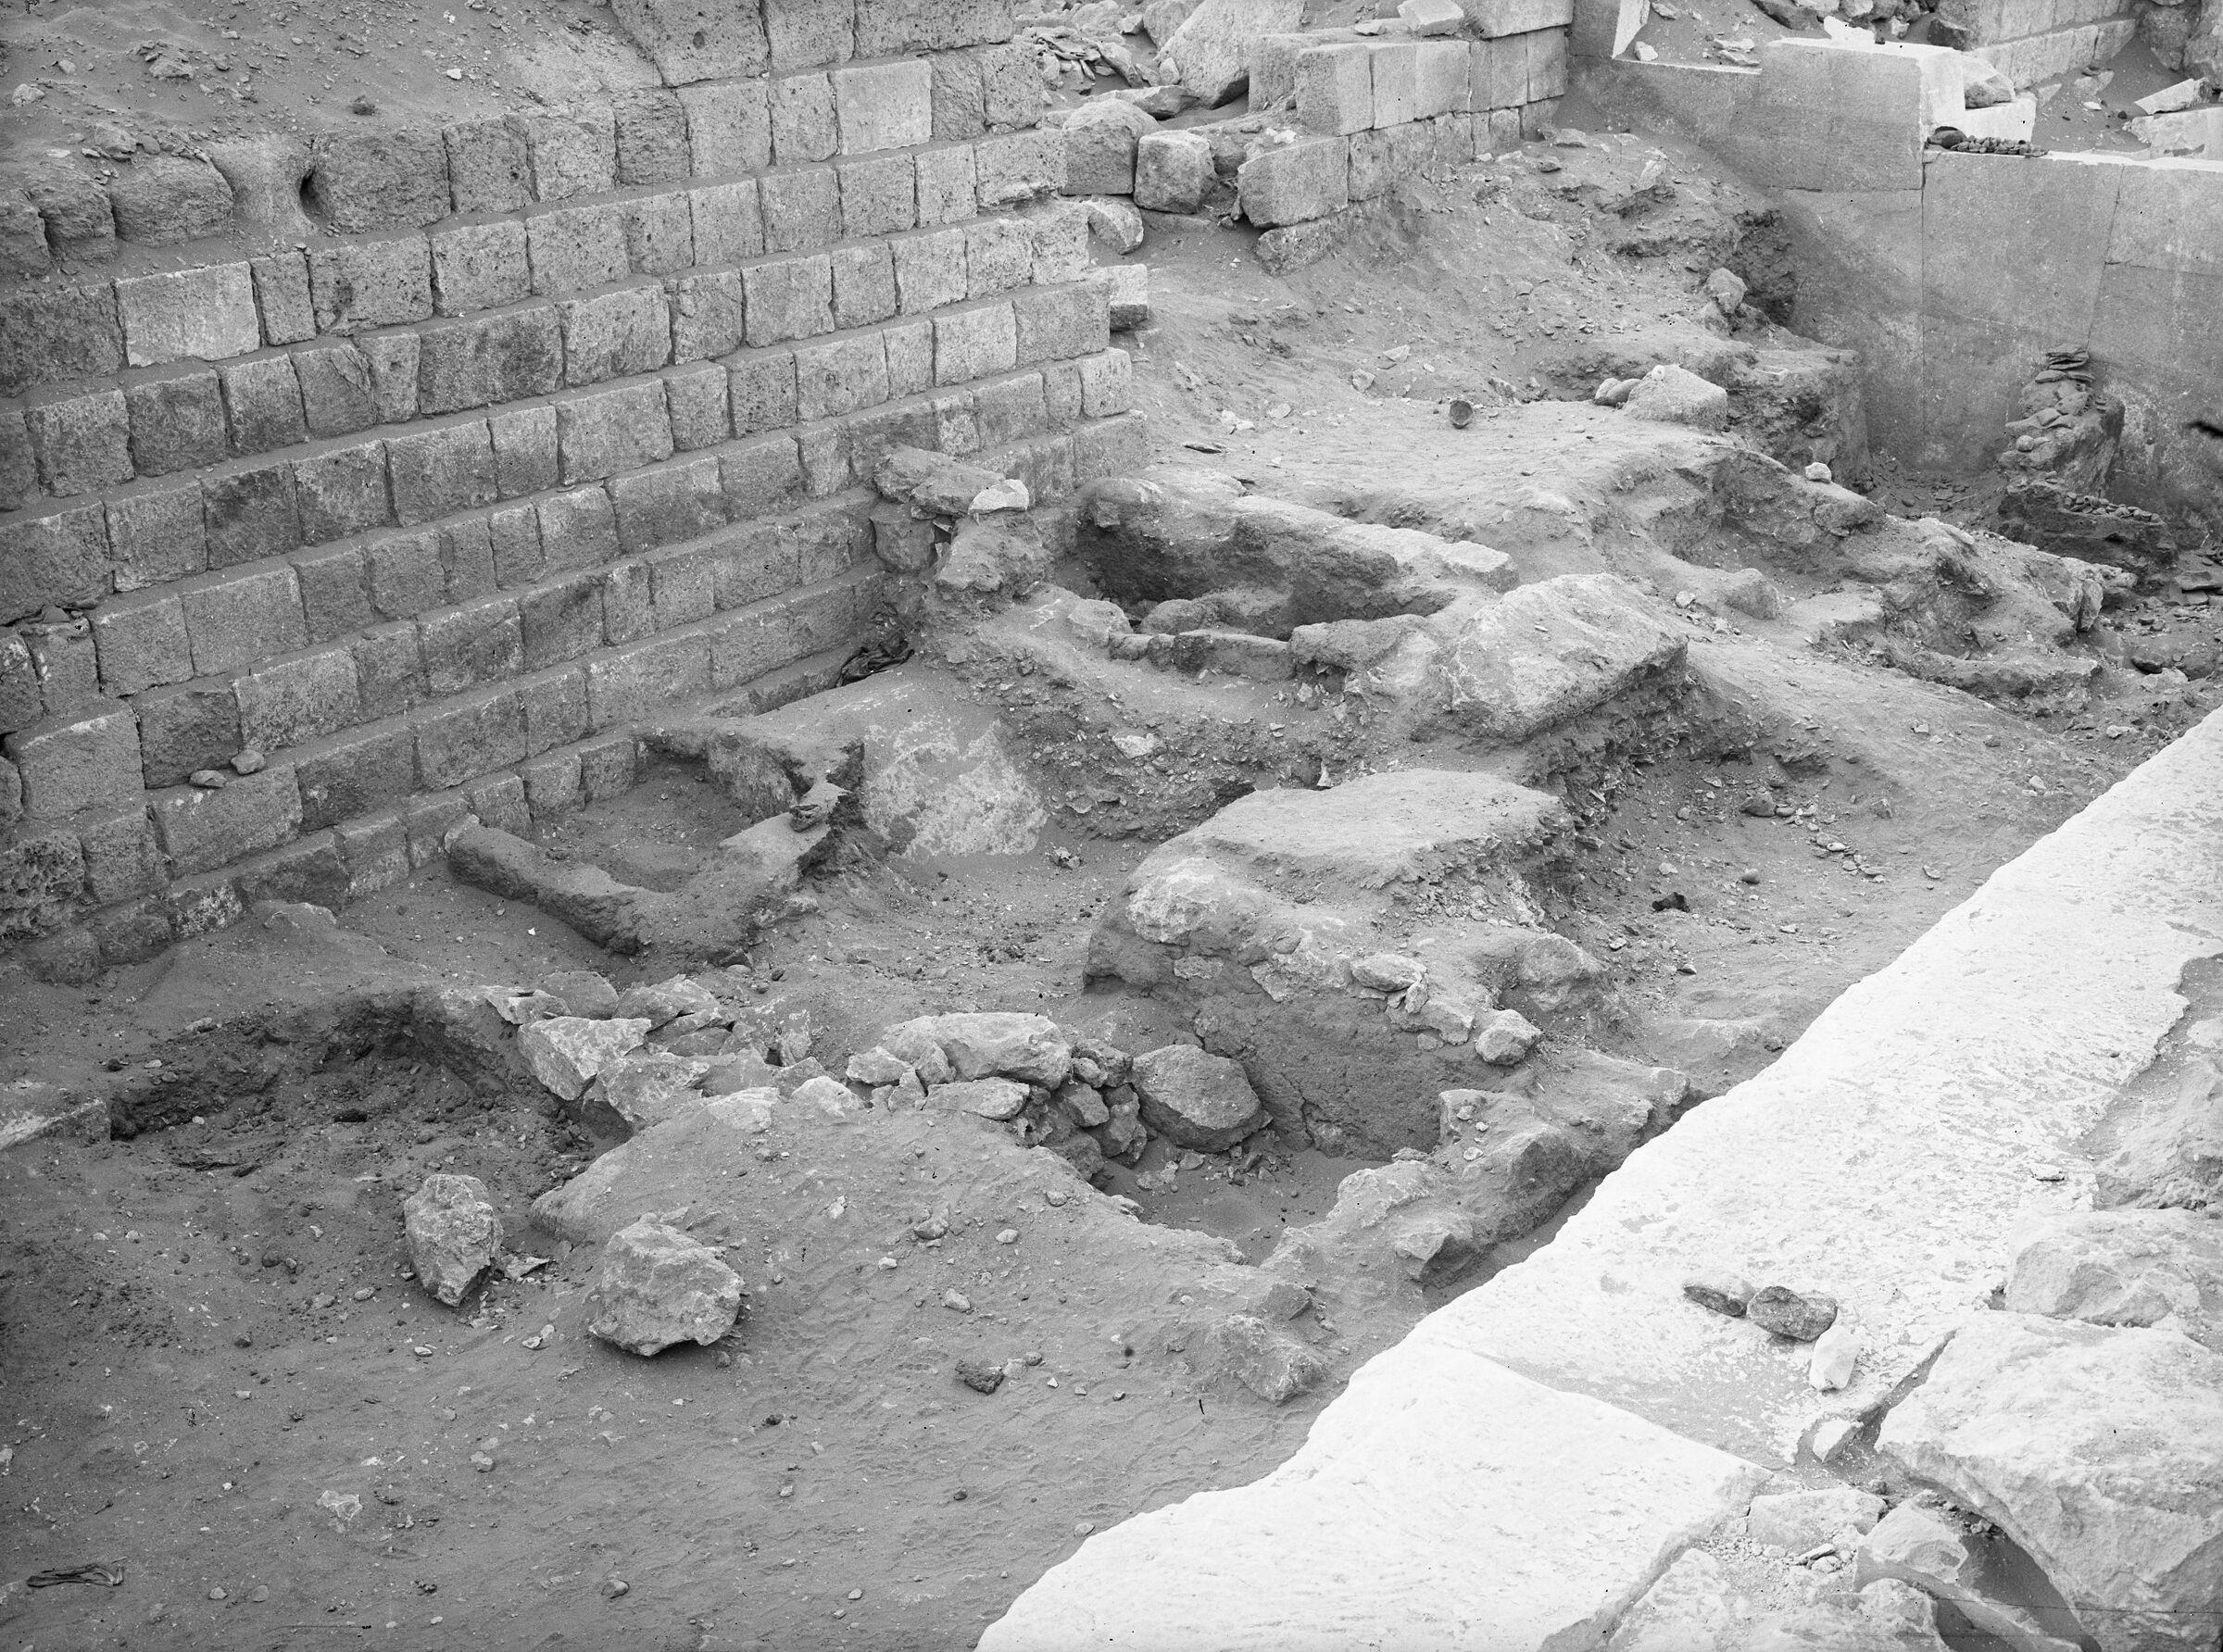 Western Cemetery: Site: Giza; View: G 2100, G 2114, G 2111, G 2112, G 2110